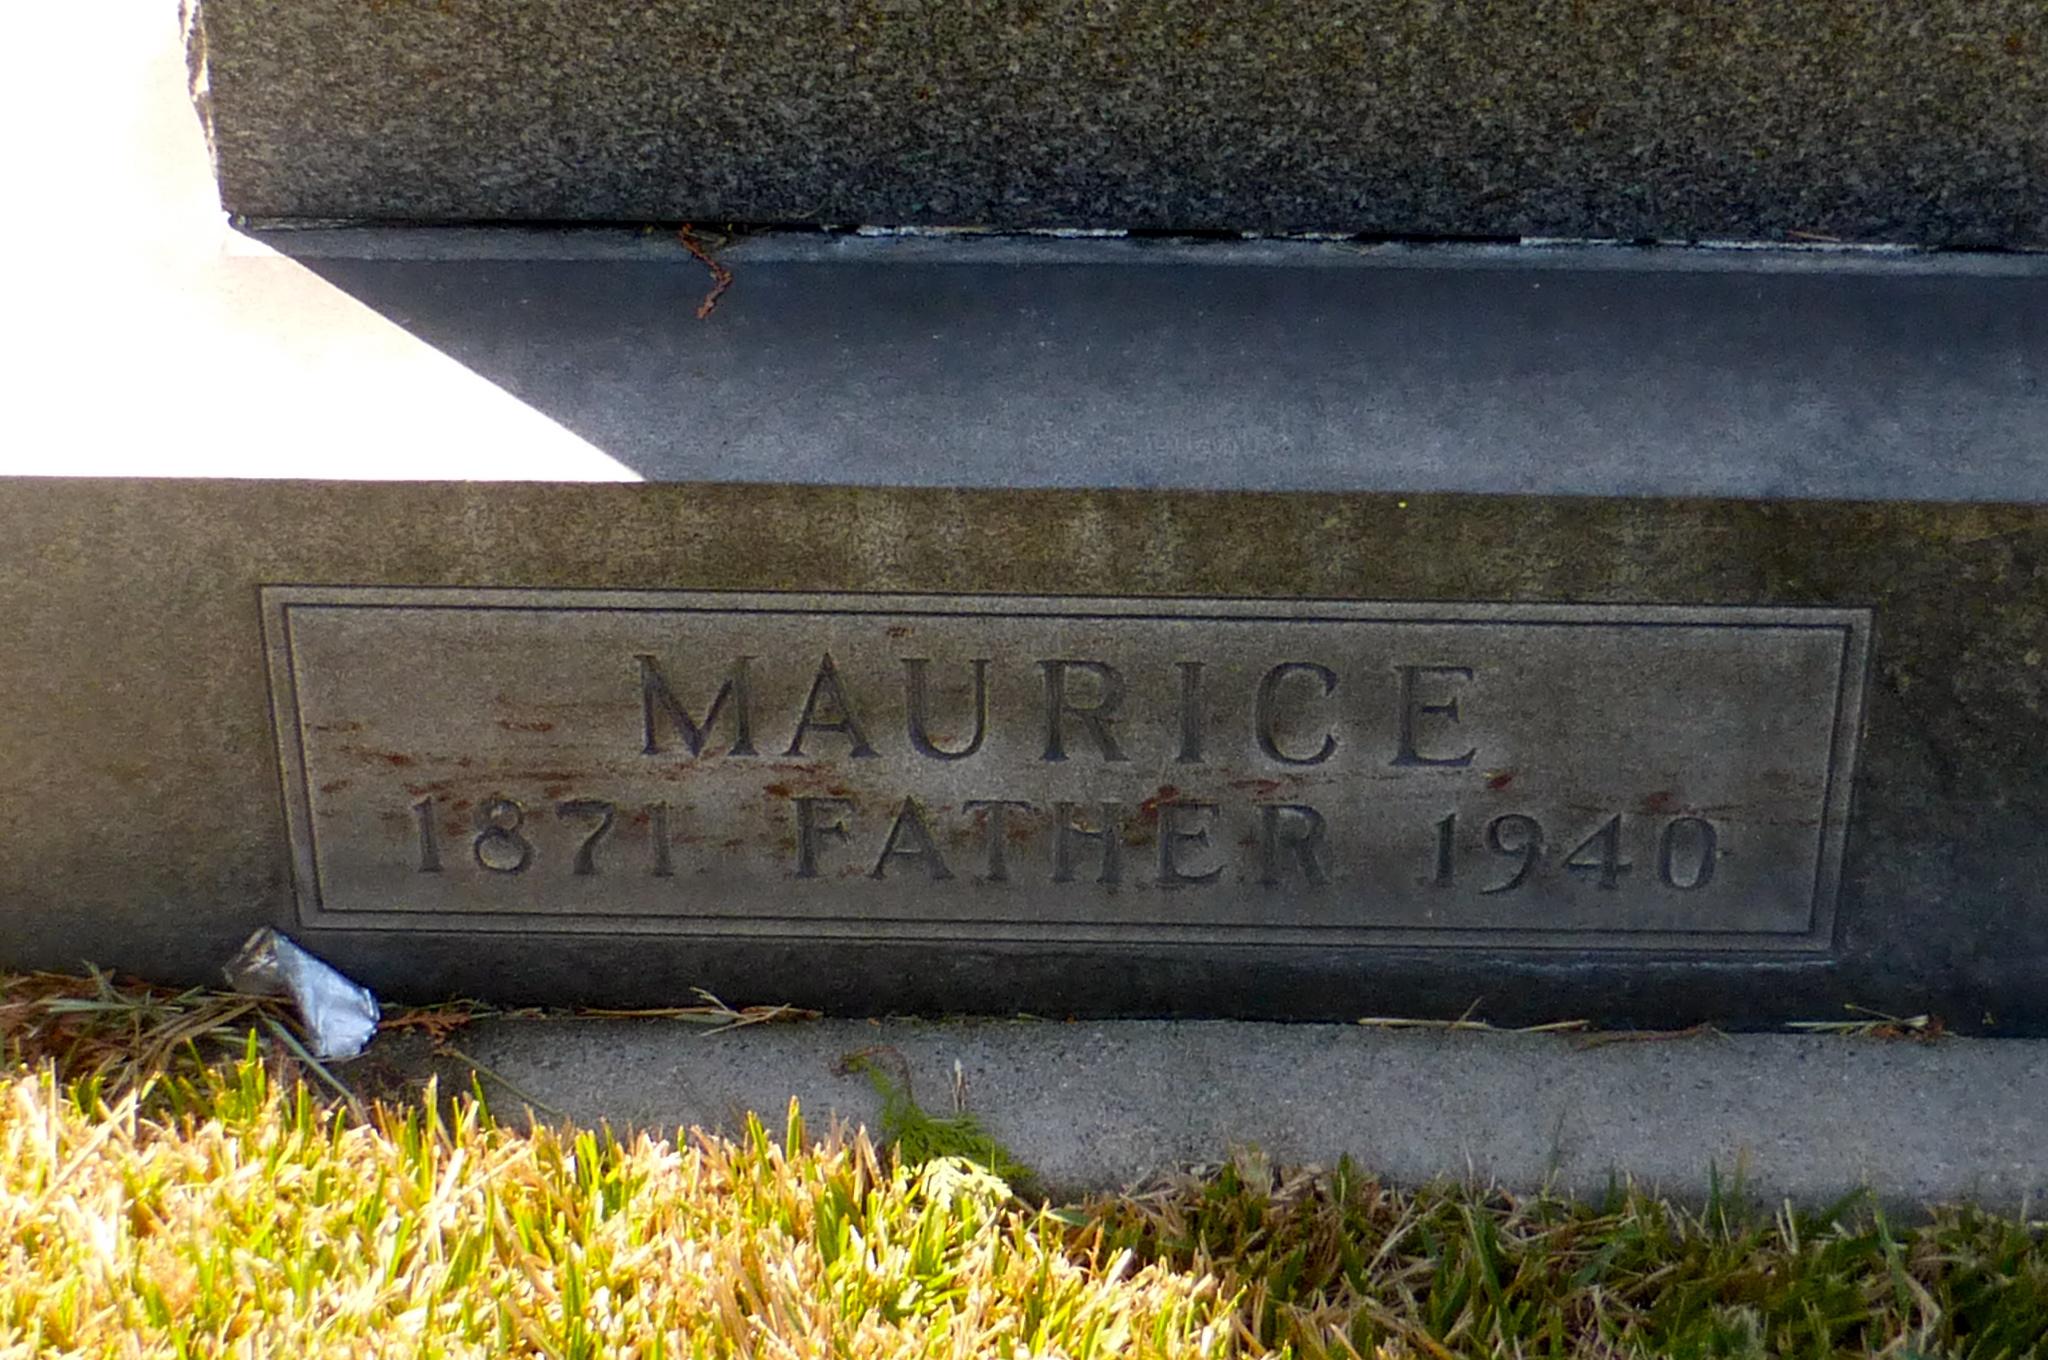 Maurice Moscovich